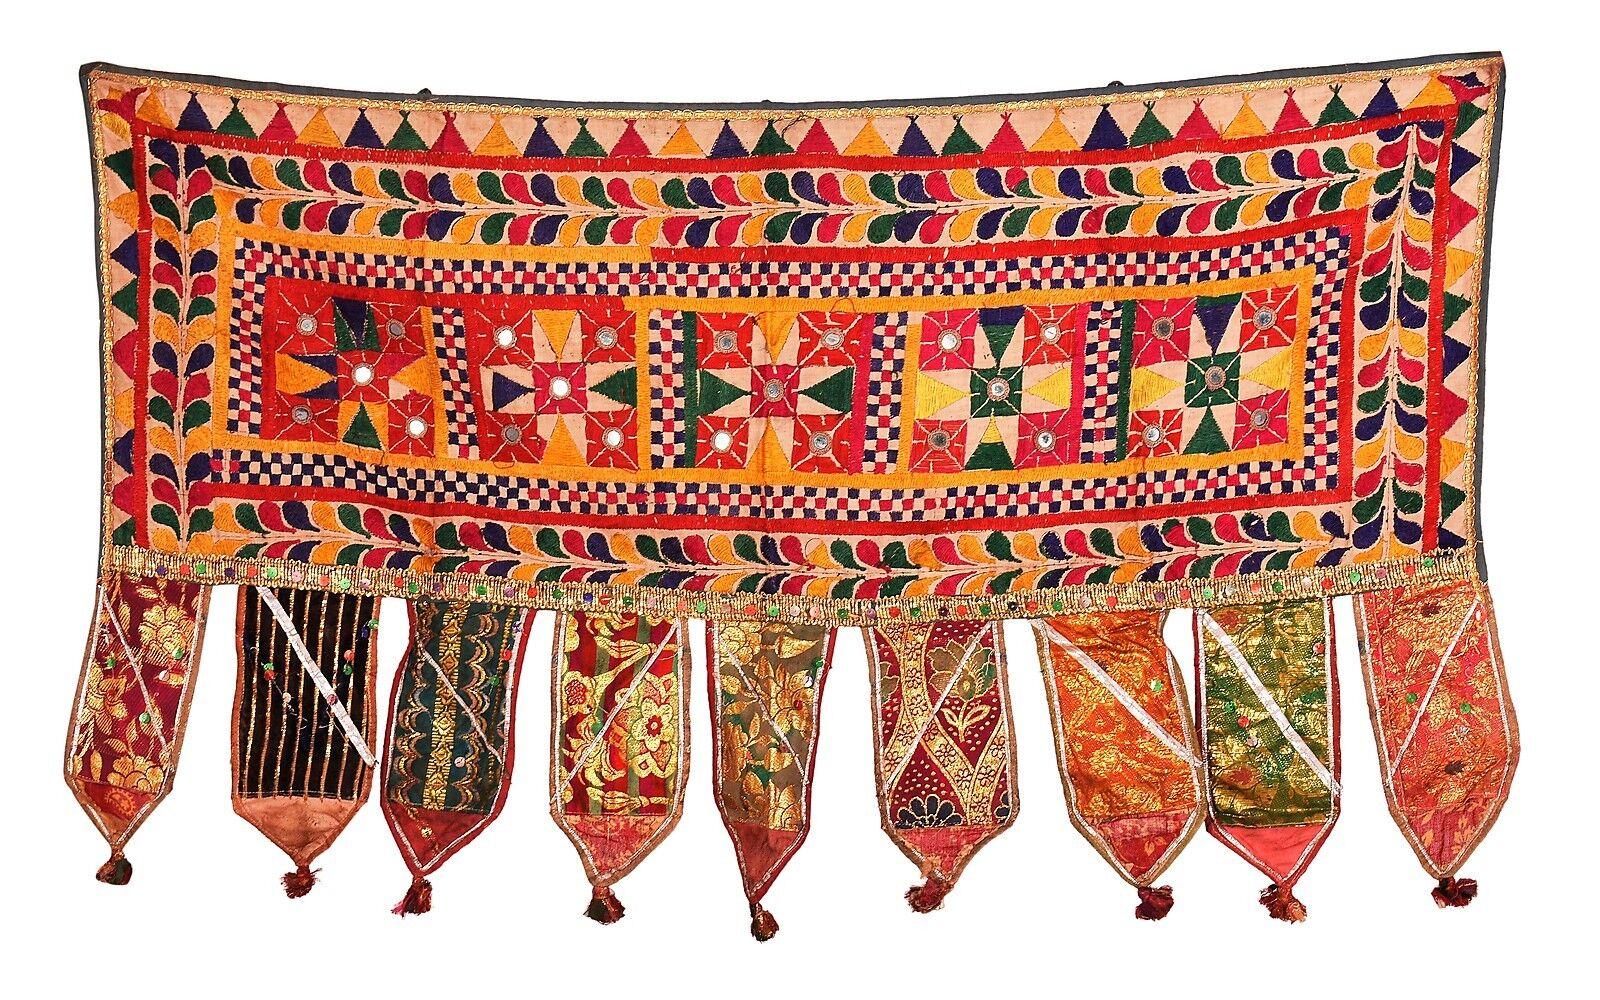 Indian Door Decor Hanging Embroiderot Vintage Cotton Window Valance Topper Toran